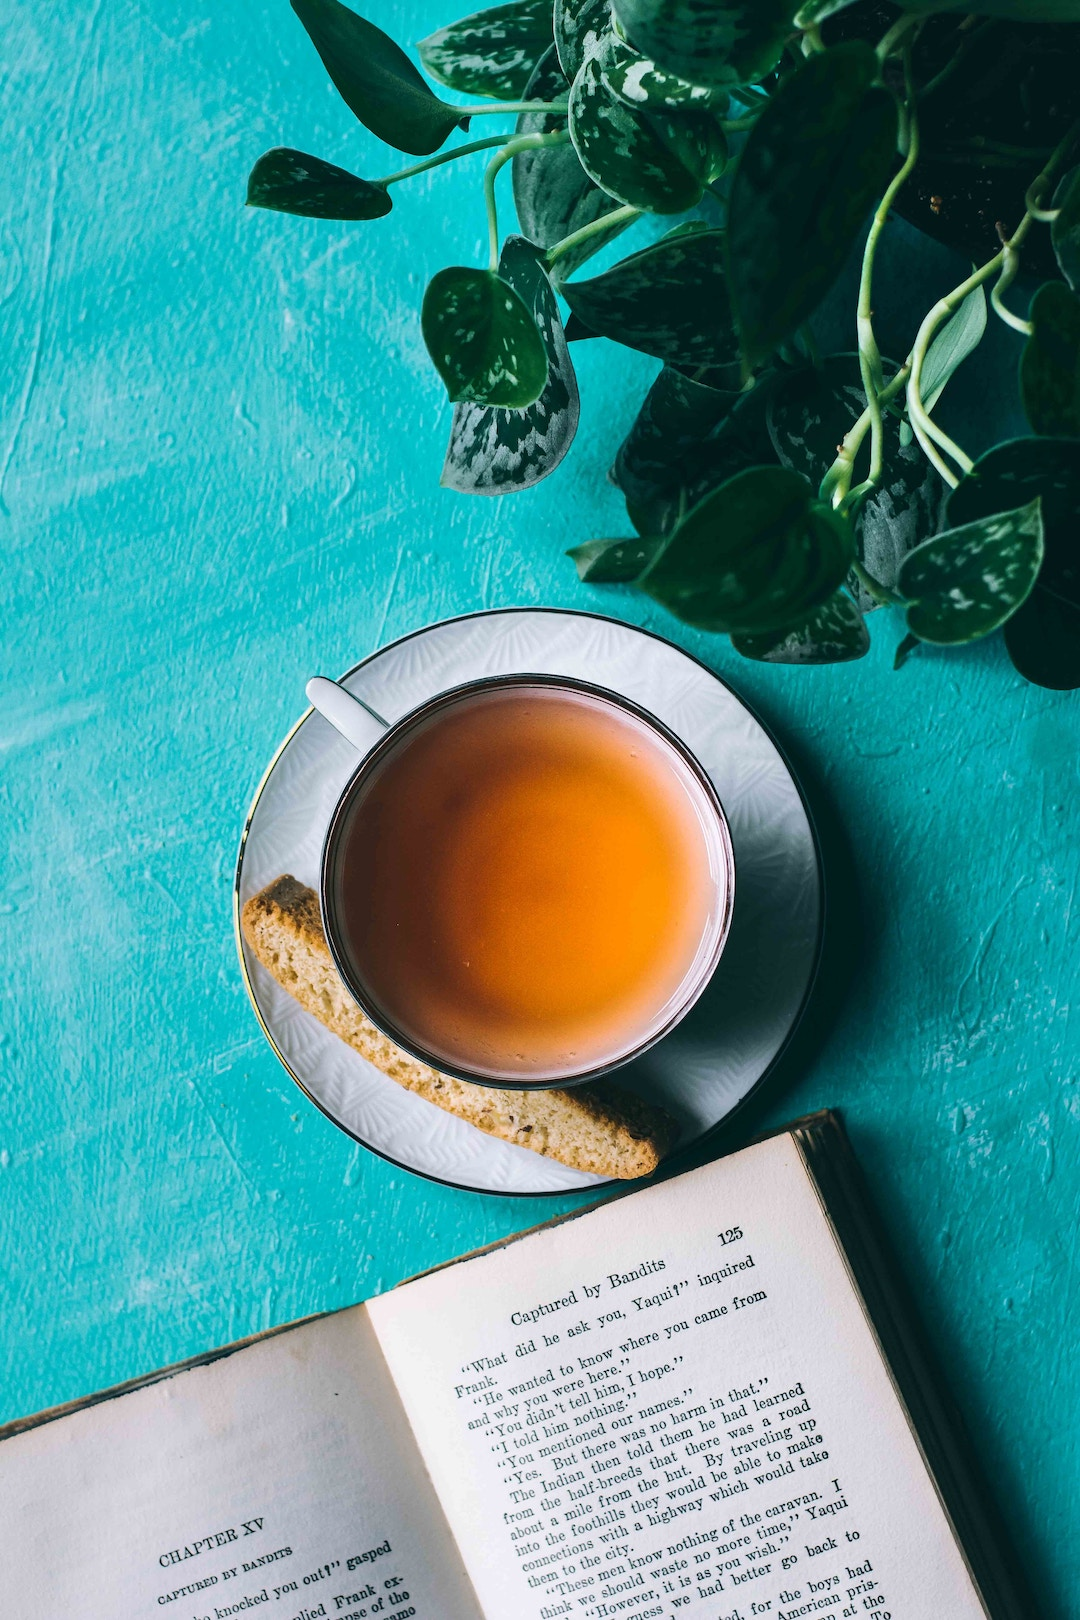 Best jasmine tea for milk tea